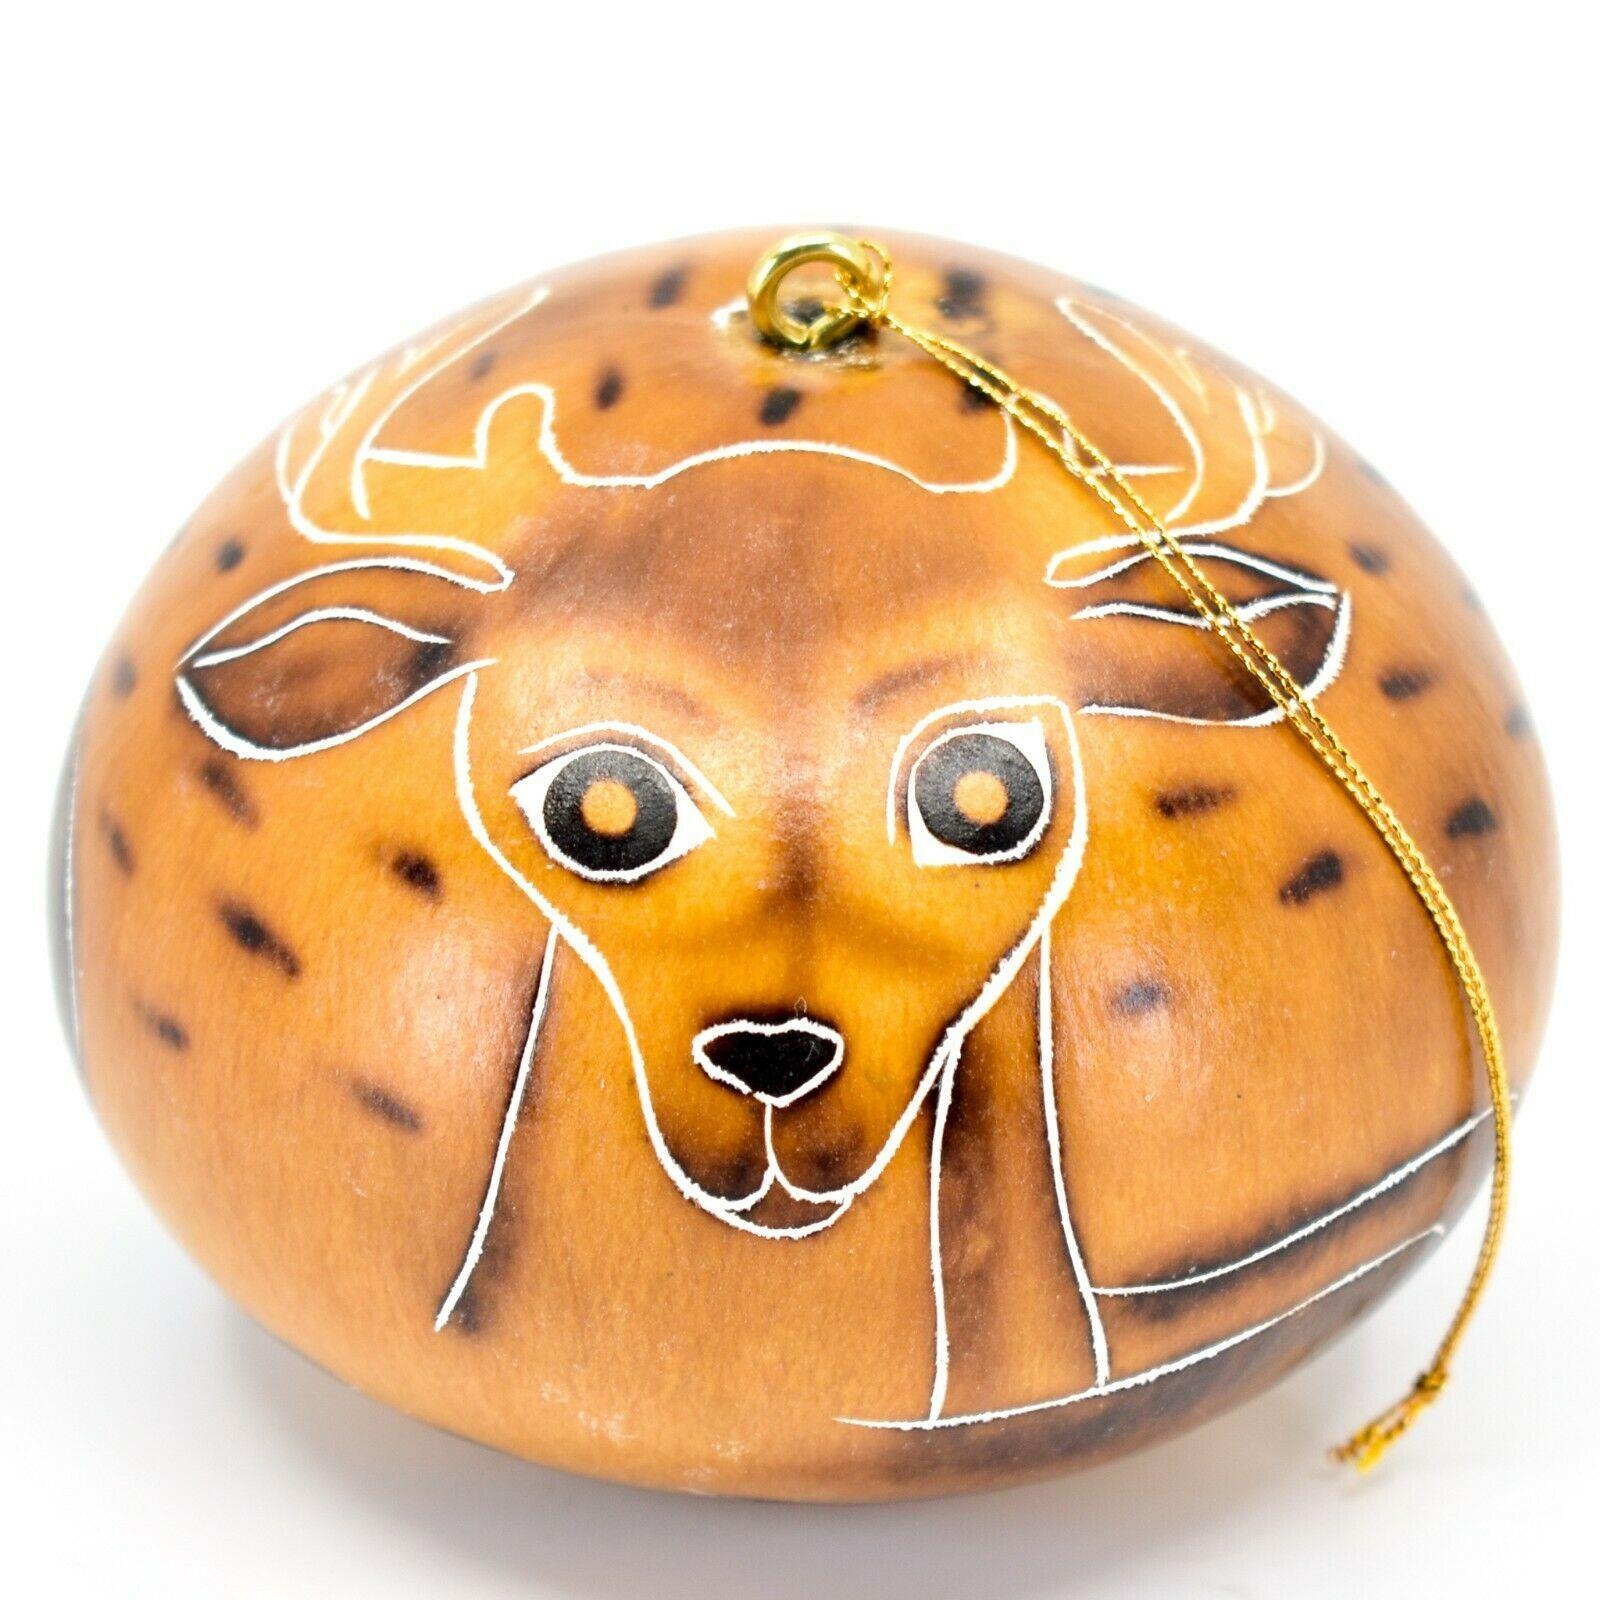 Handcrafted Carved Gourd Art Deer Buck Animal Ornament Made in Peru